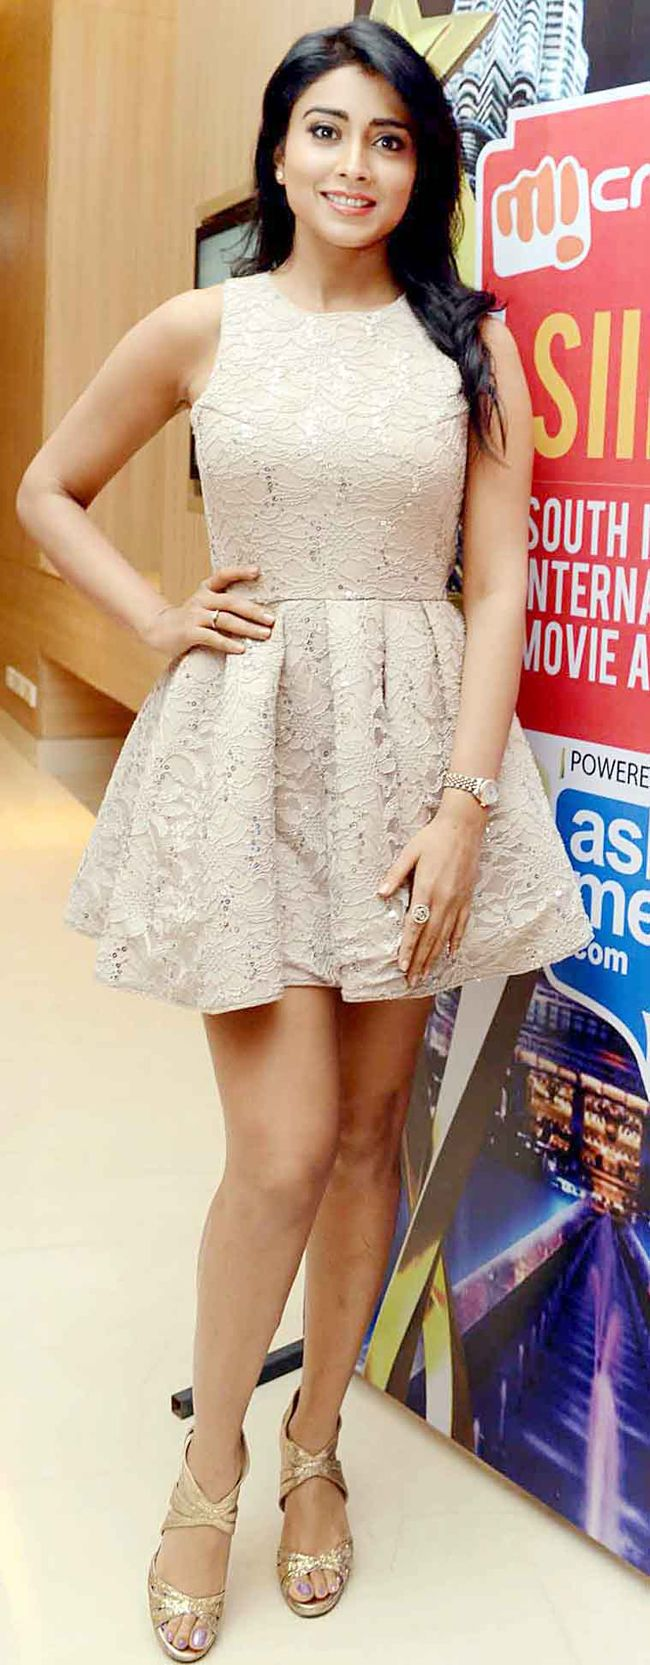 Shriya Saran at a press meet in a lace full-skirted dress. #Style #Bollywood #Fashion #Beauty